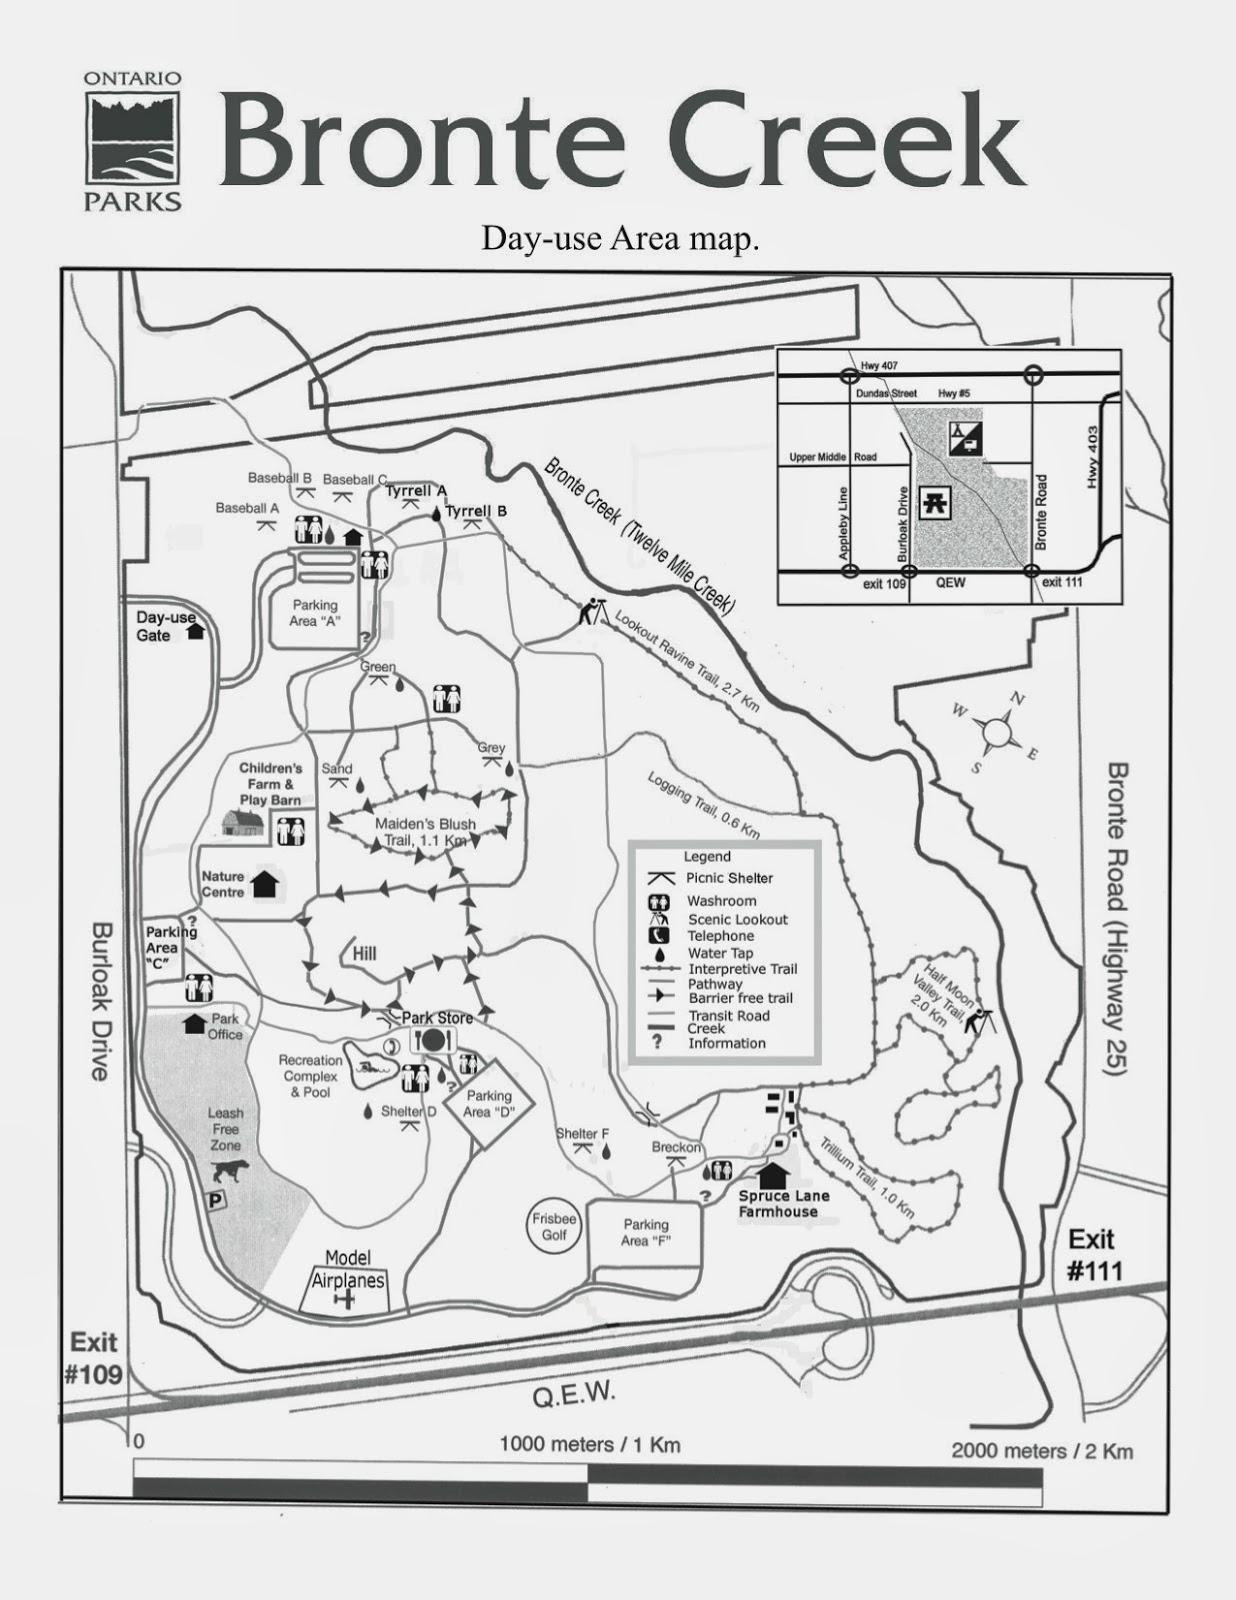 Bronte Creek Provincial Park Map Ontario Provincial Parks: Best Campsites and Reviews: Bronte Creek  Bronte Creek Provincial Park Map